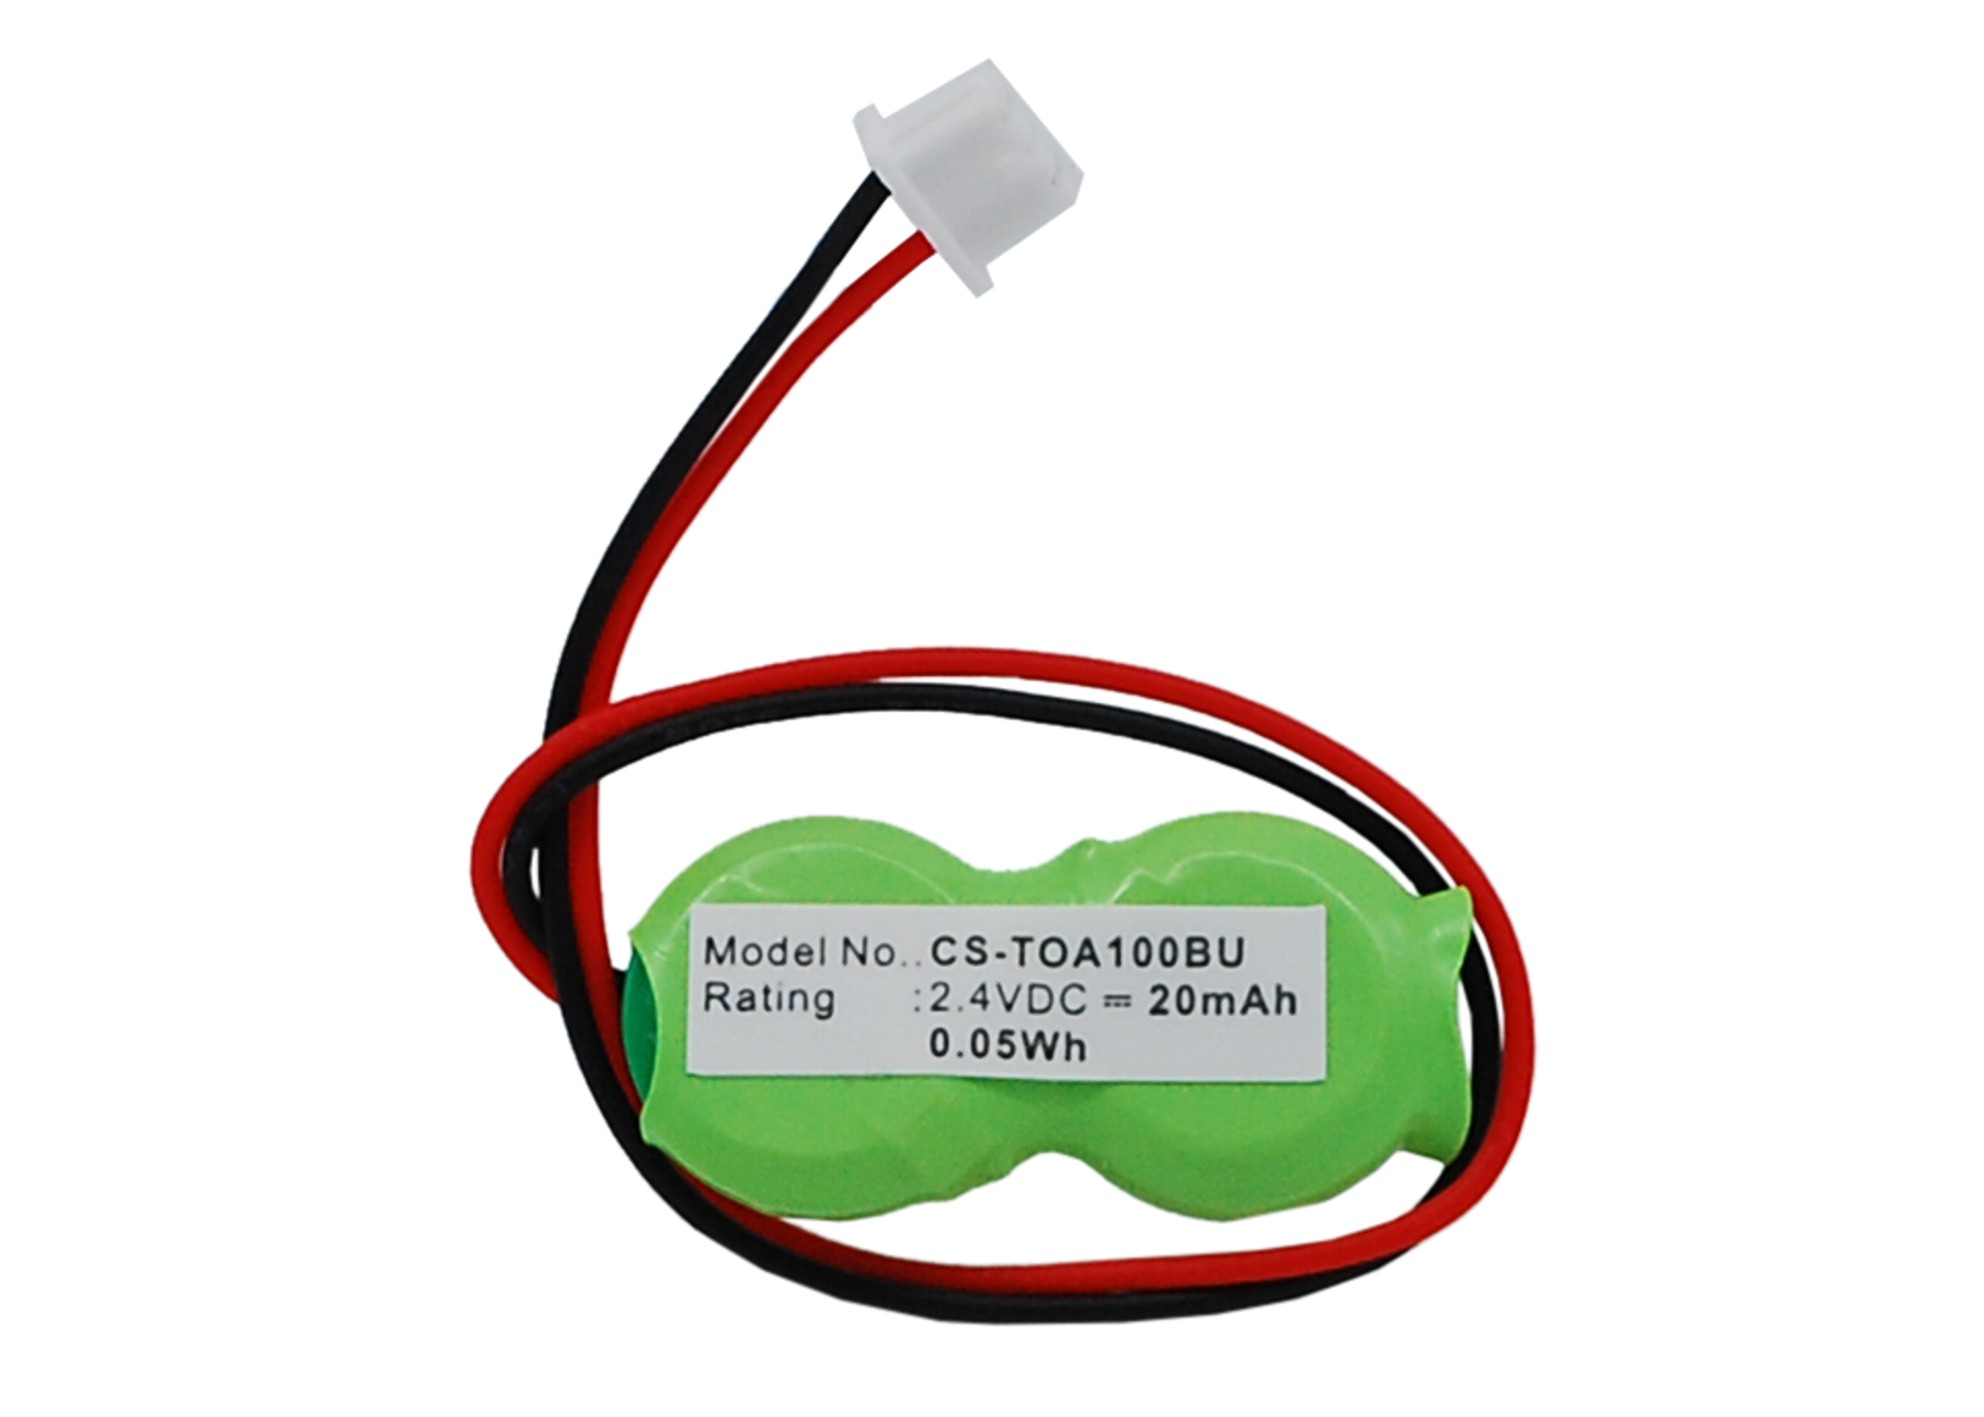 Cameron Sino baterie cmos pro TOSHIBA Portege R600-SP2801R 2.4V Ni-MH 20mAh zelená - neoriginální